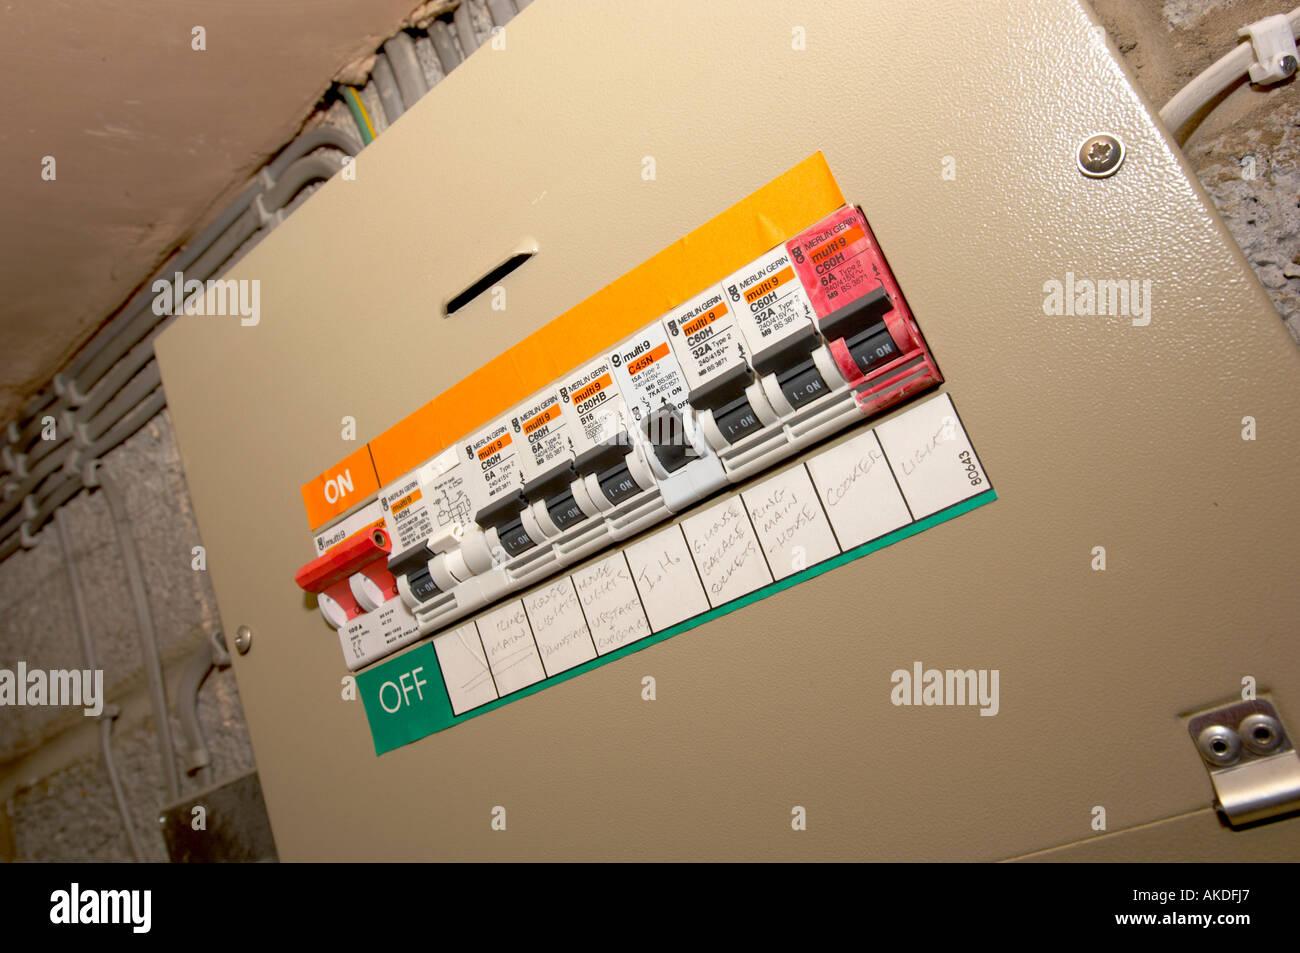 hight resolution of domestic fuse box circuit breaker stock image